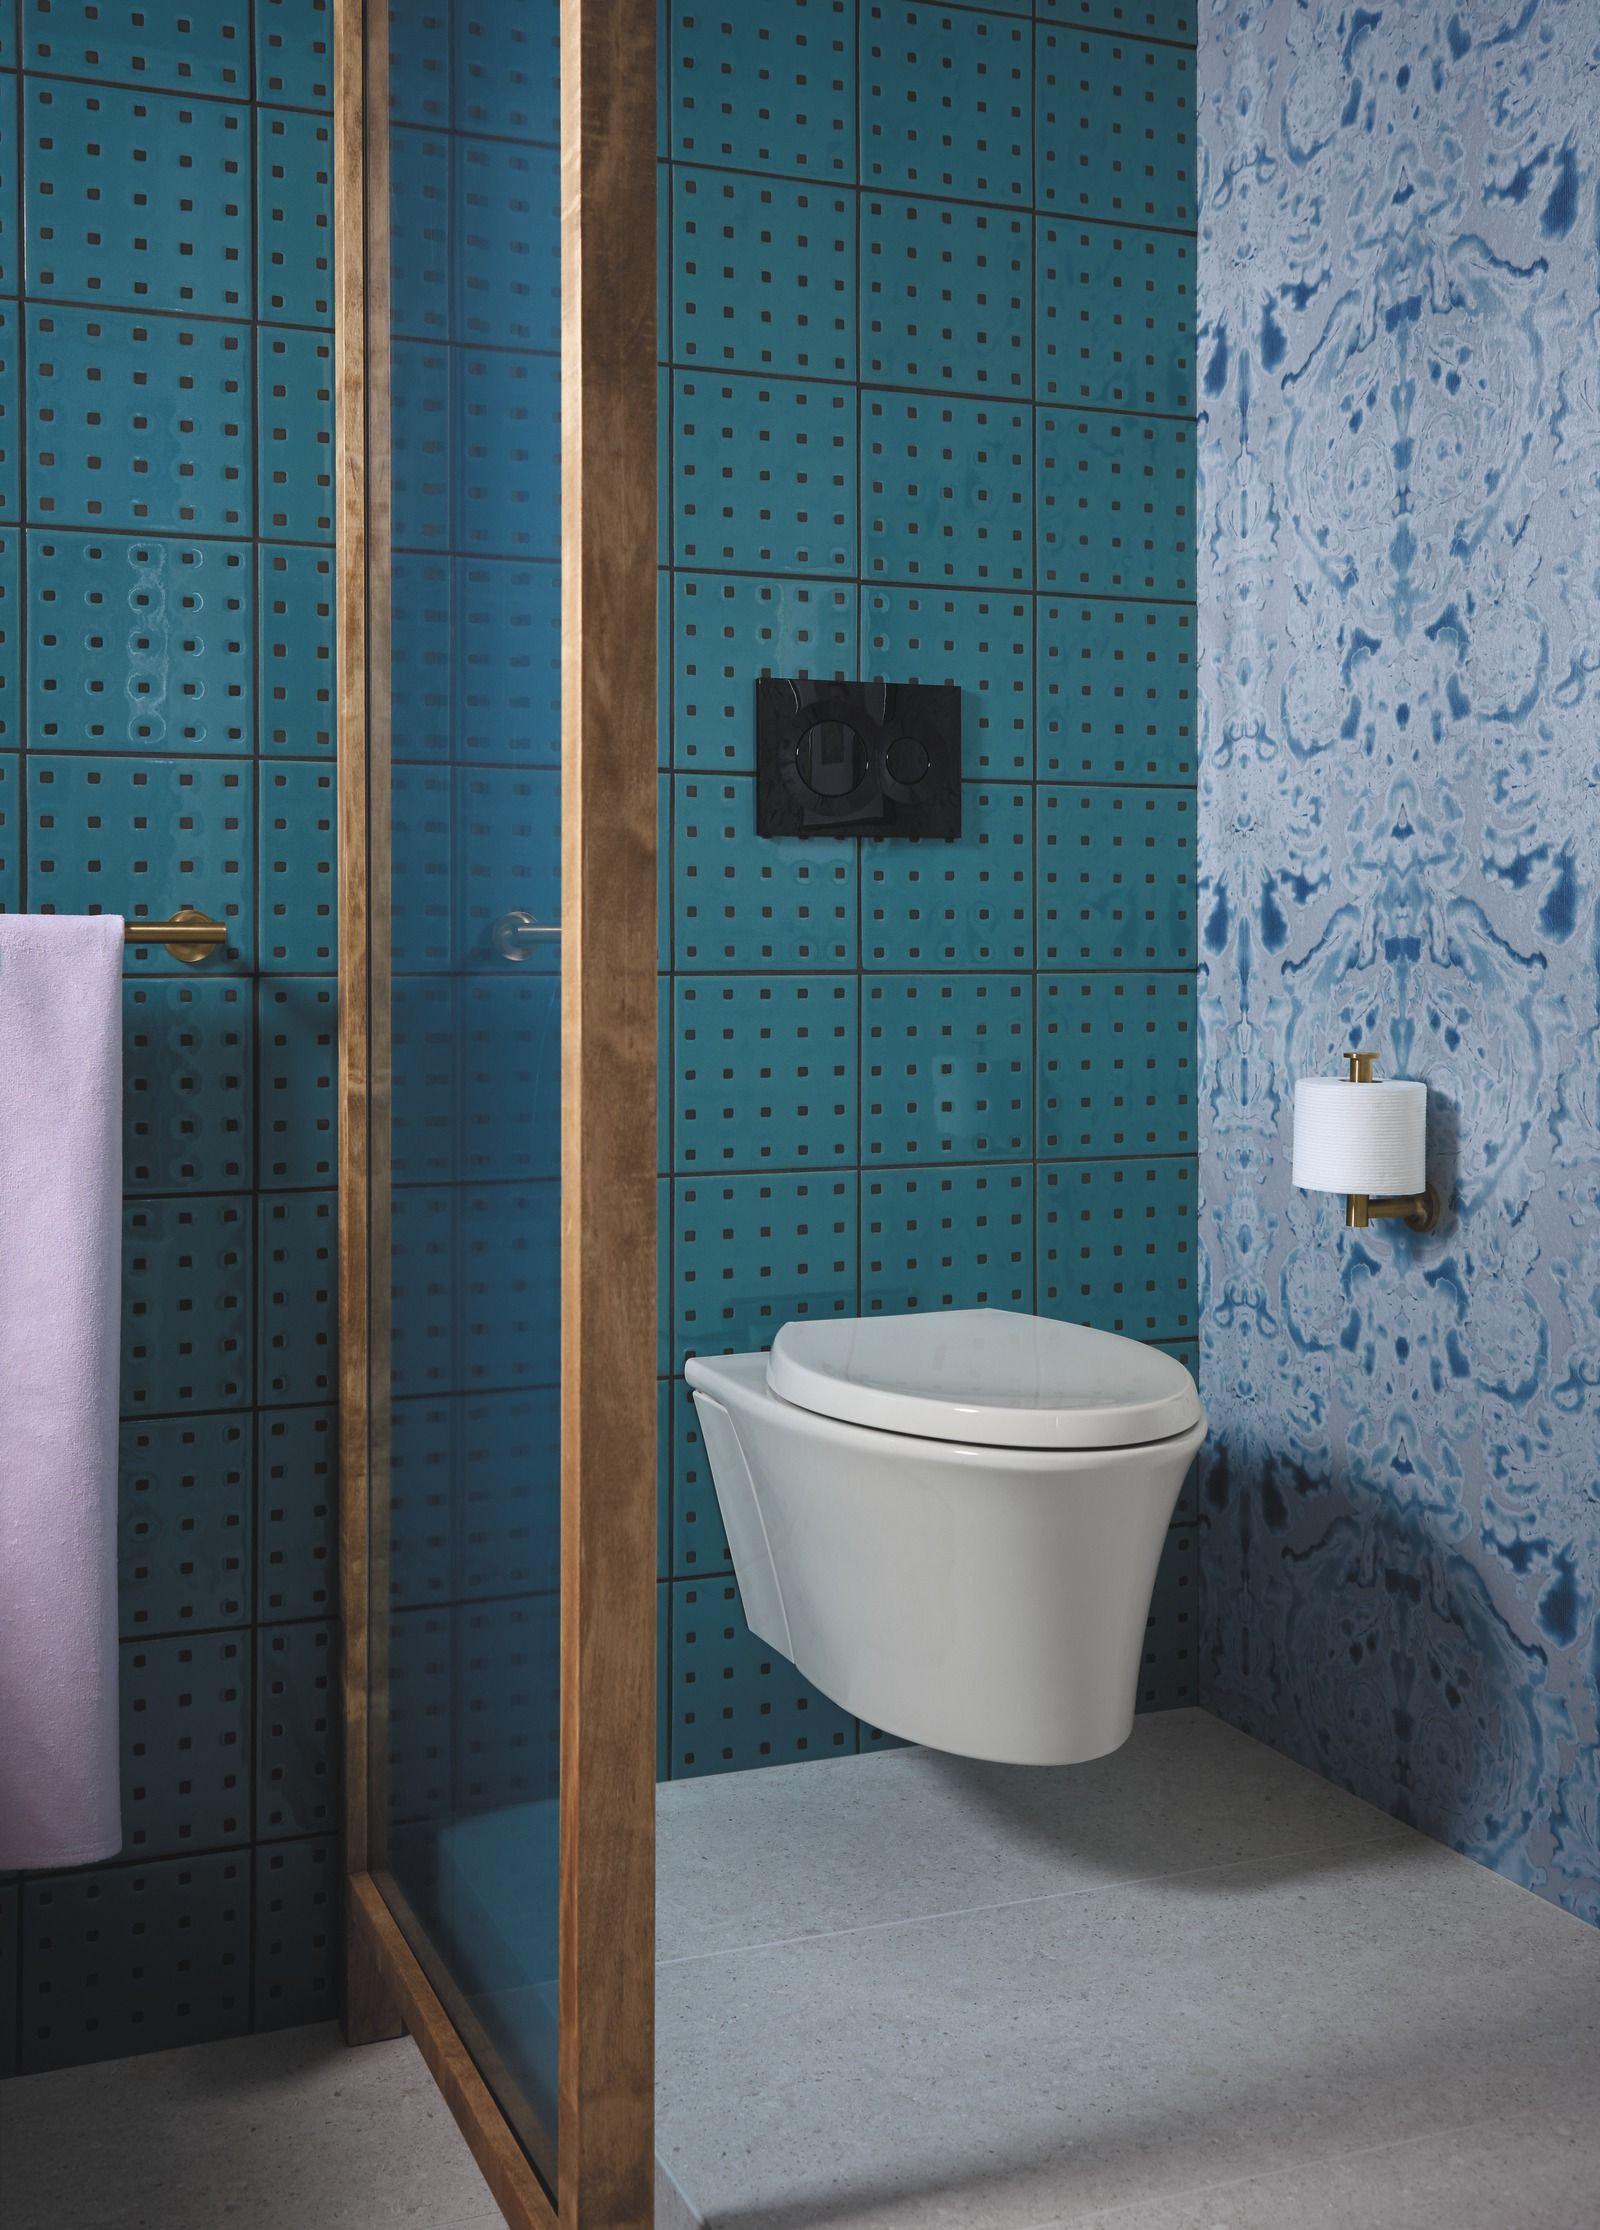 Hint of Havana Bathroom | Hint of Havana Bathroom | Pinterest | Wall ...